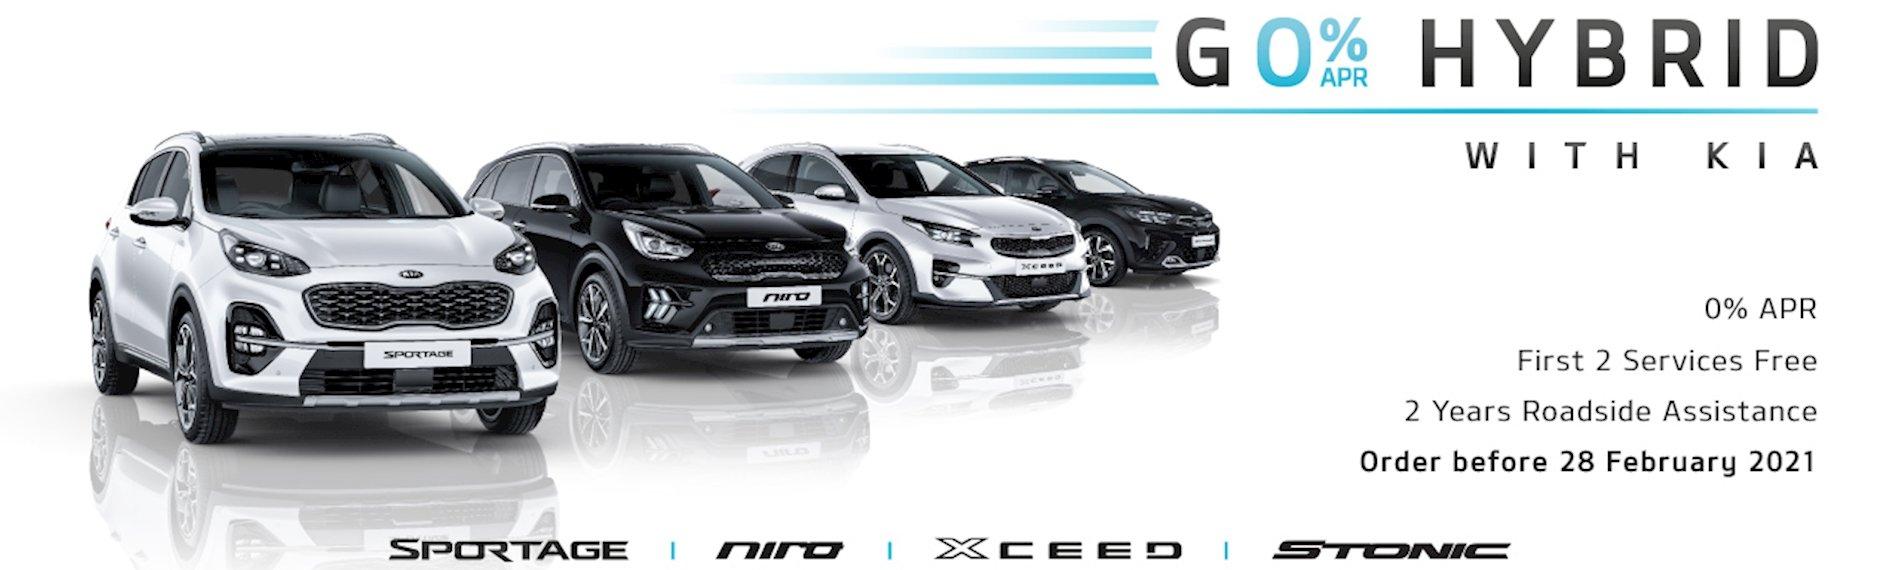 Go Hybrid, 0% APR